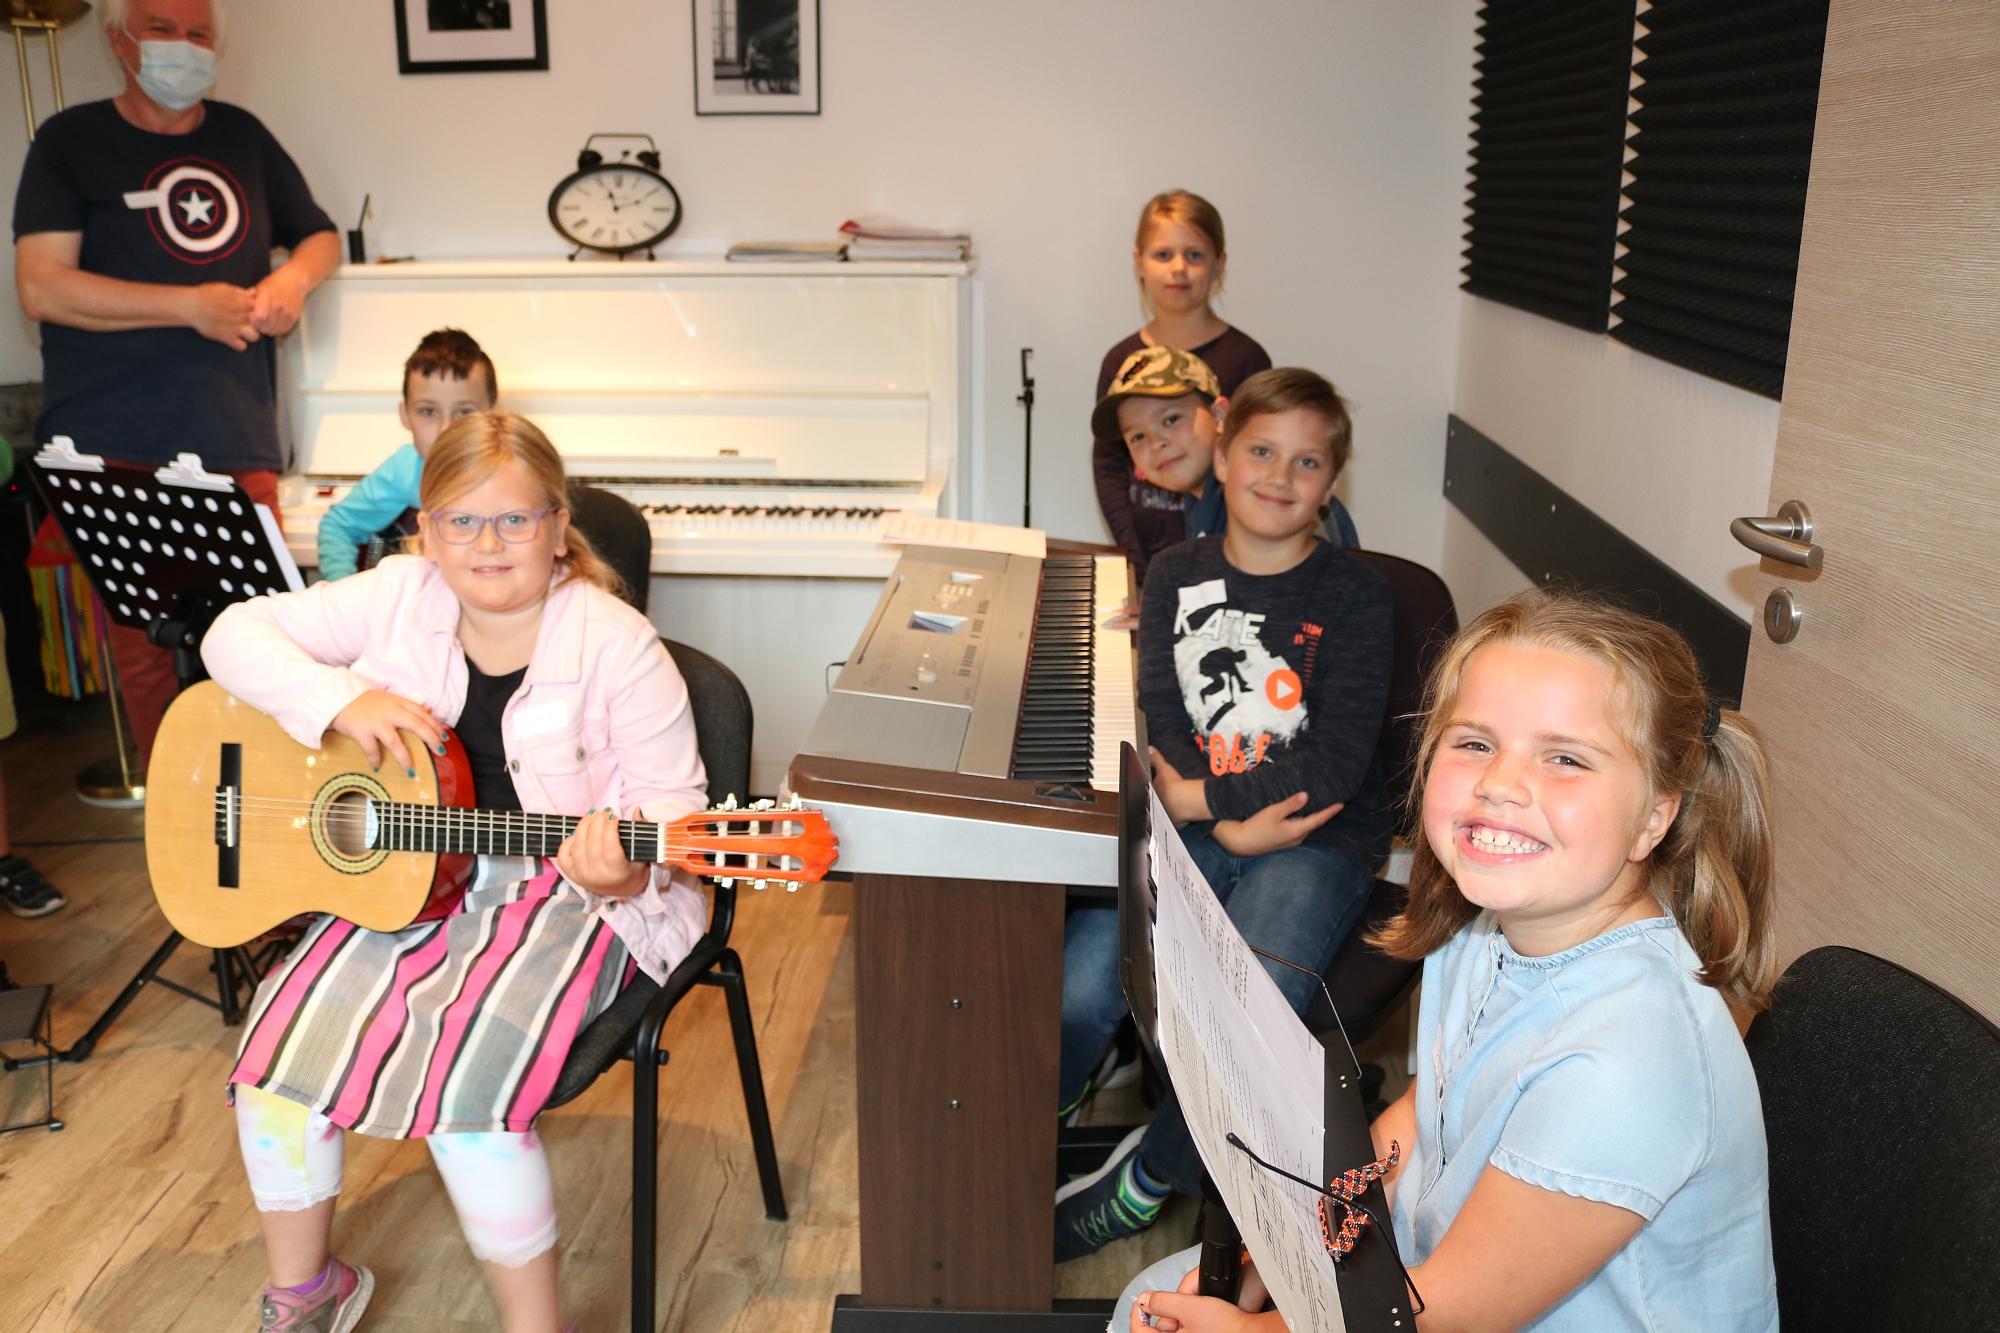 202007 Bandprobe FP Musikschule Harmonie 7